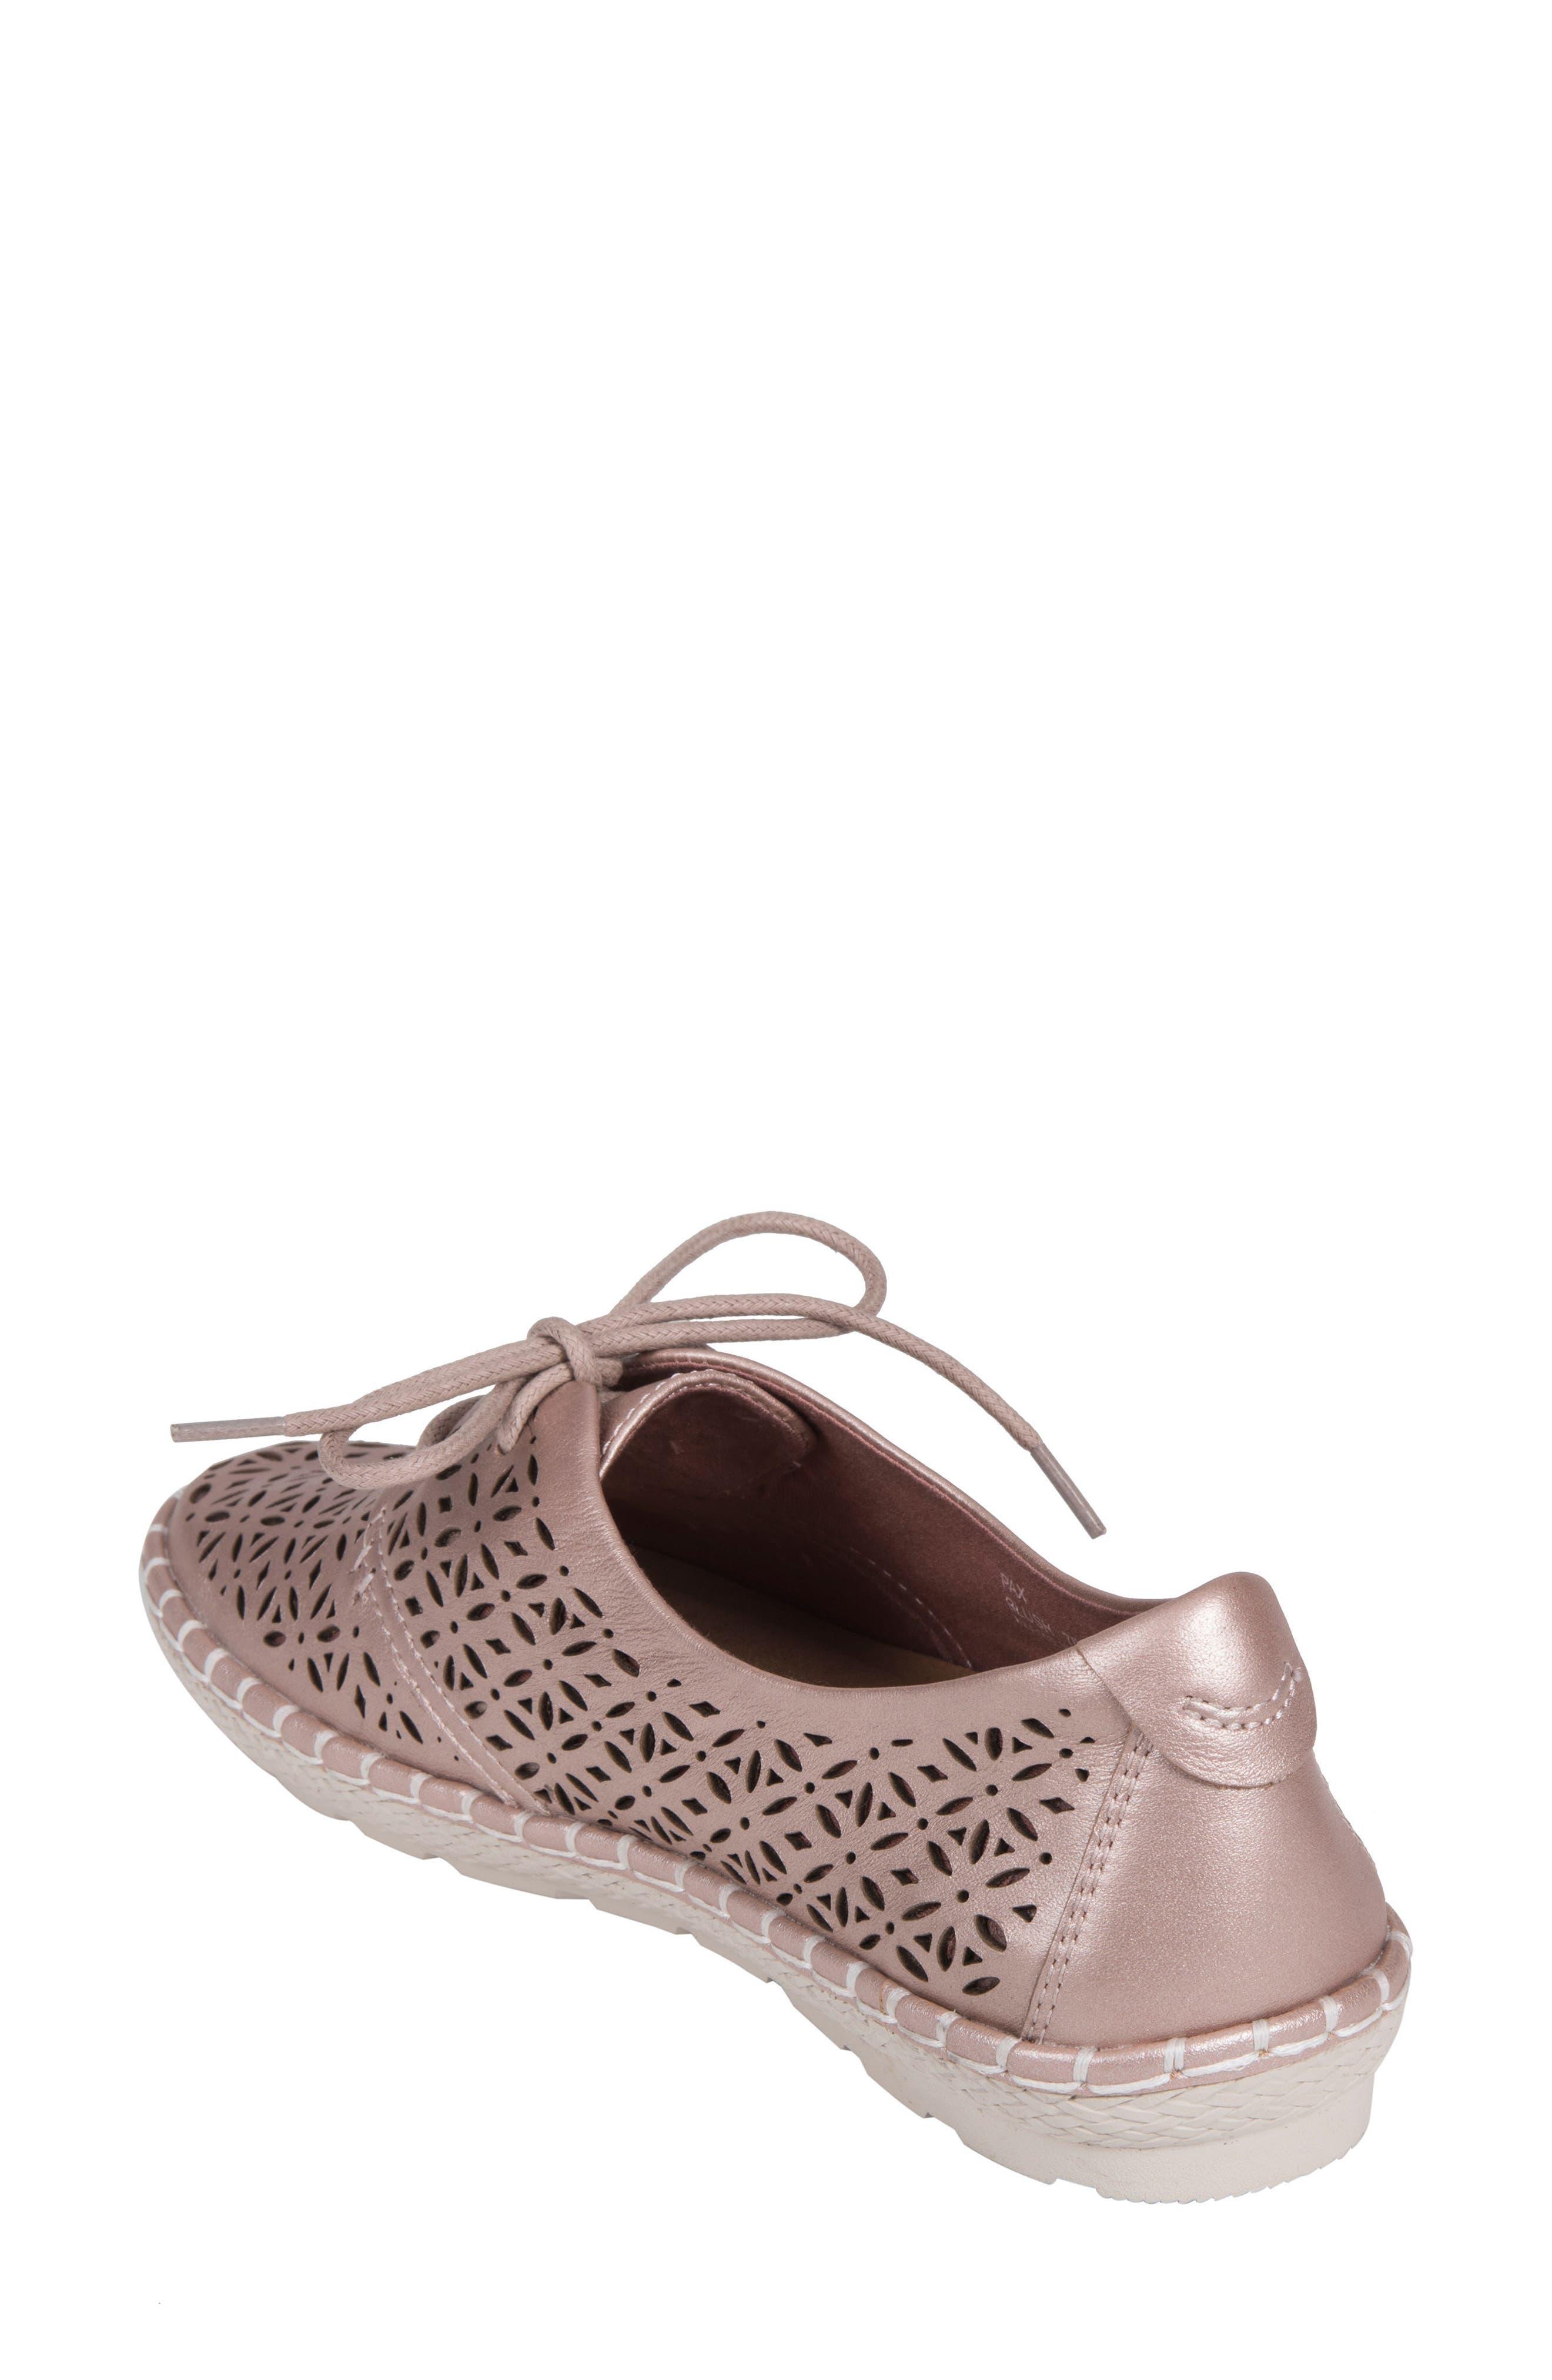 Pax Sneaker,                             Alternate thumbnail 2, color,                             BLUSH LEATHER